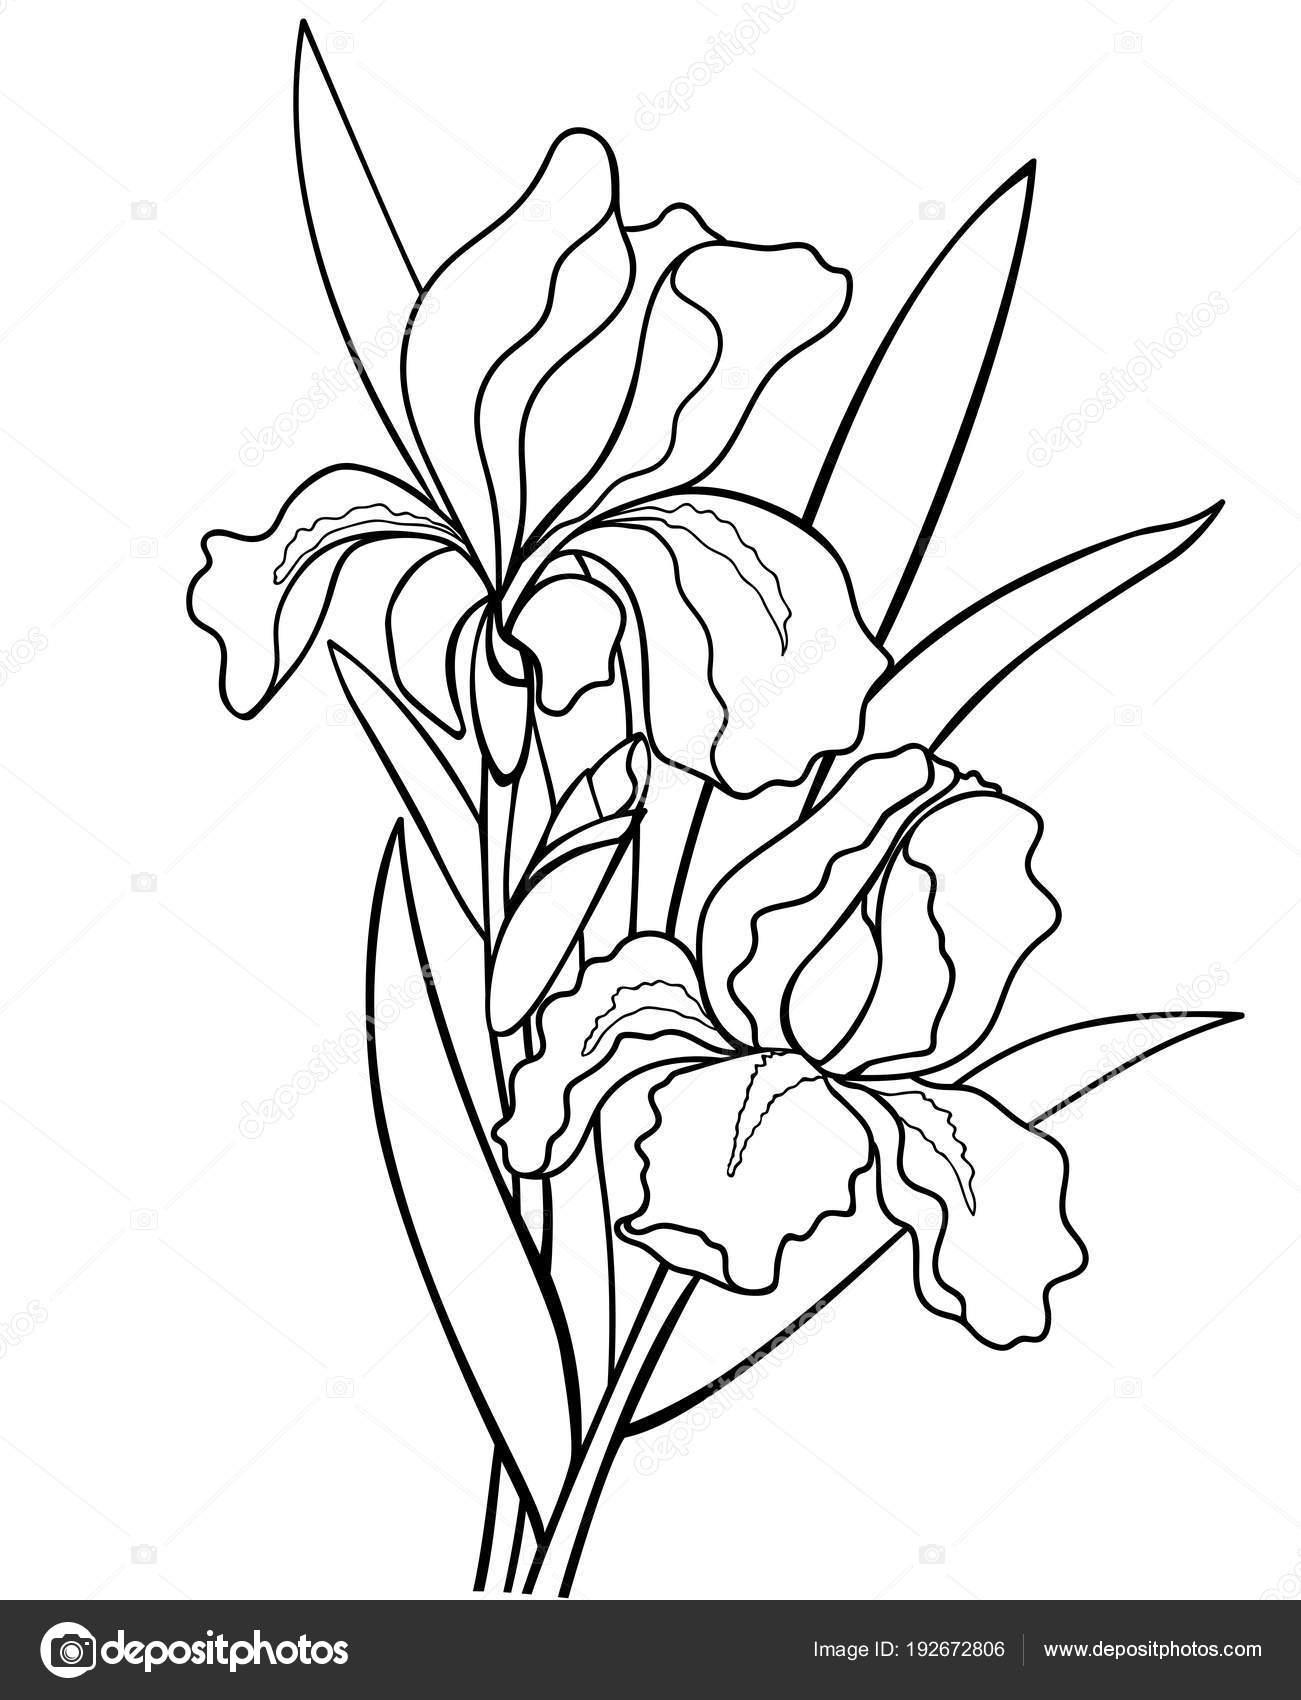 Dibujos silueta de rosas para colorear flores con hojas iris ilustraci n bot nica dibujo - Coloriage fleur iris ...